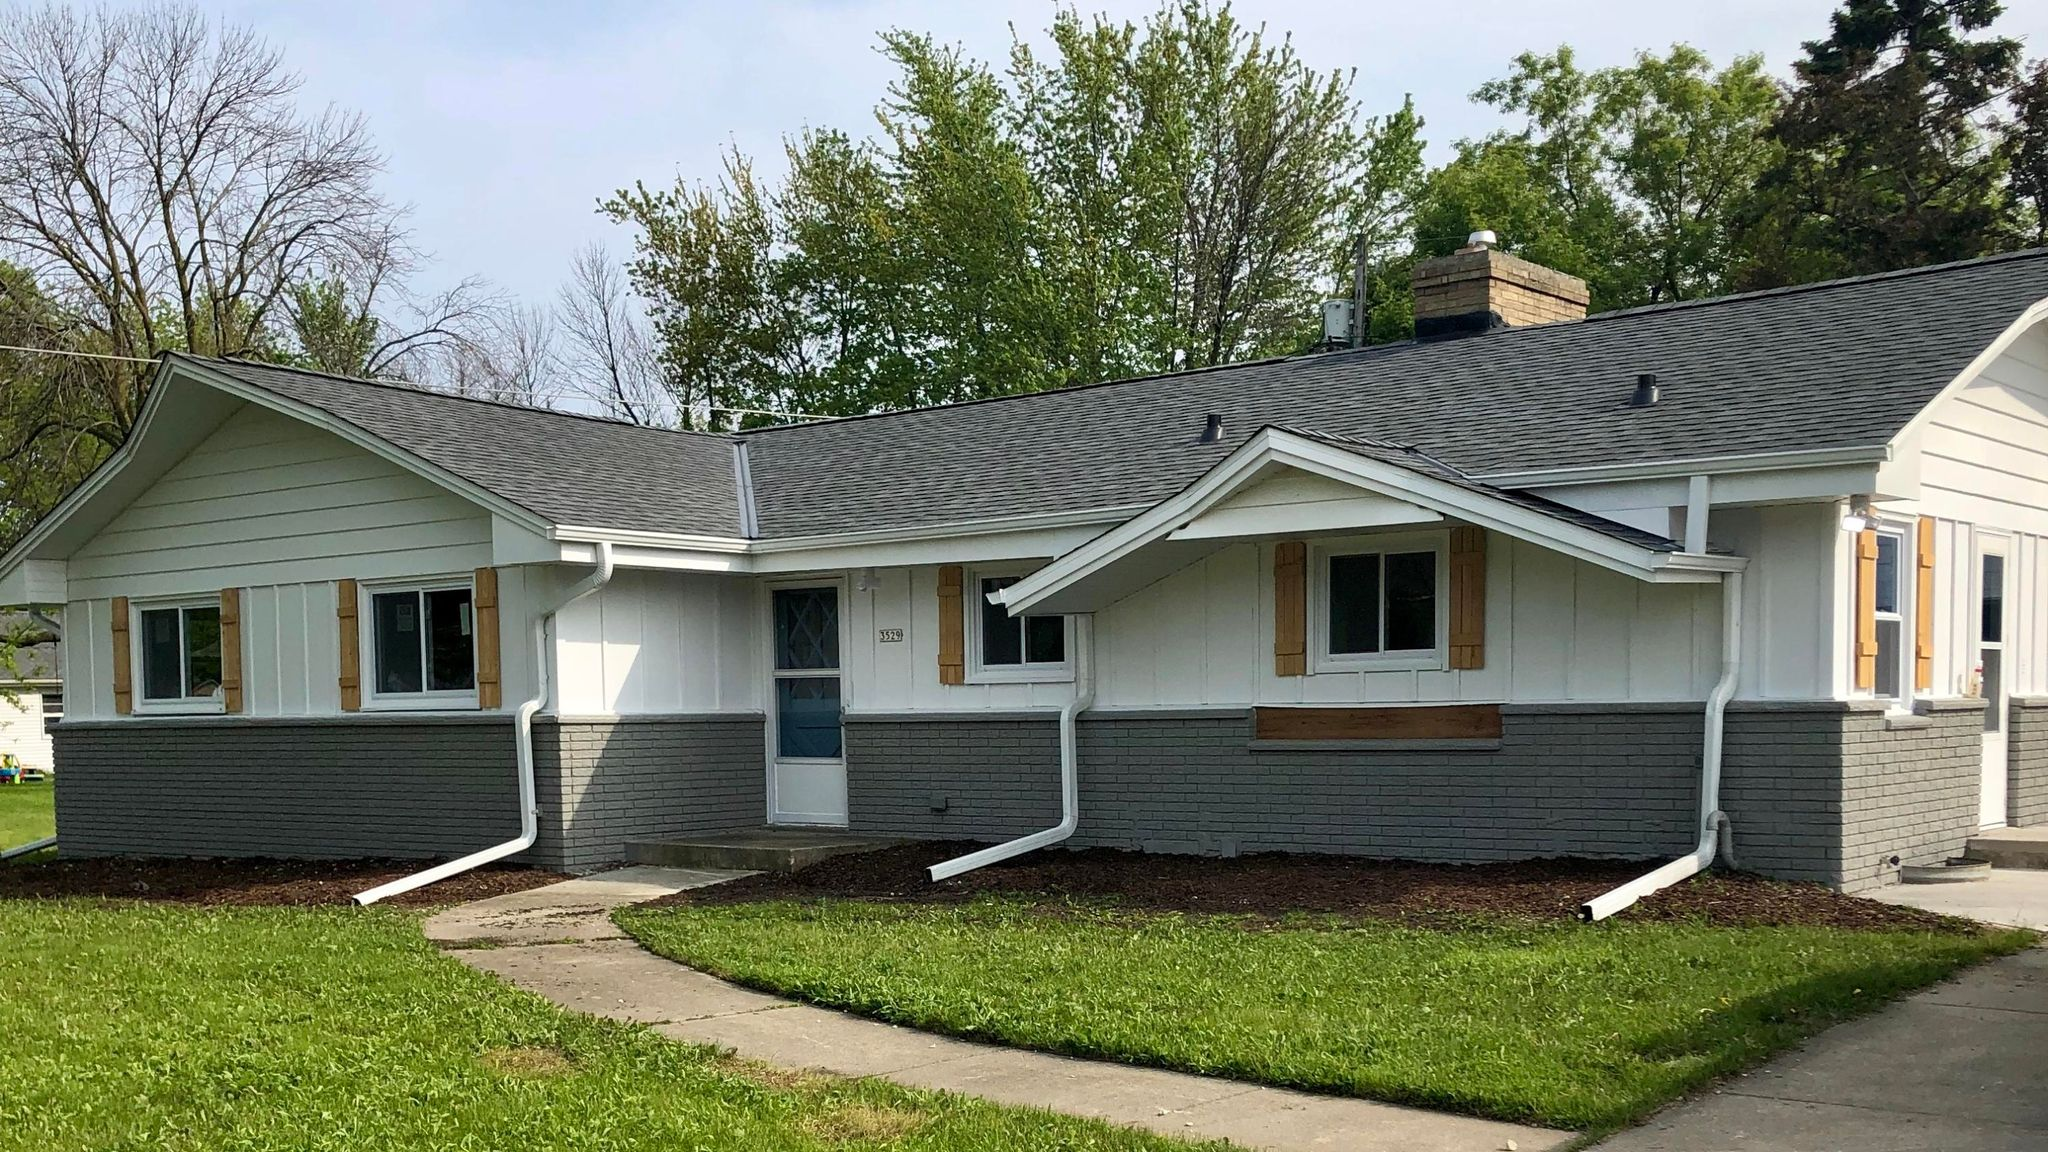 3529 Spring St, Racine, WI 53405 - 3 Bed, 3 Bath Single-Family Home - MLS  #1640577 - 23 Photos | Trulia